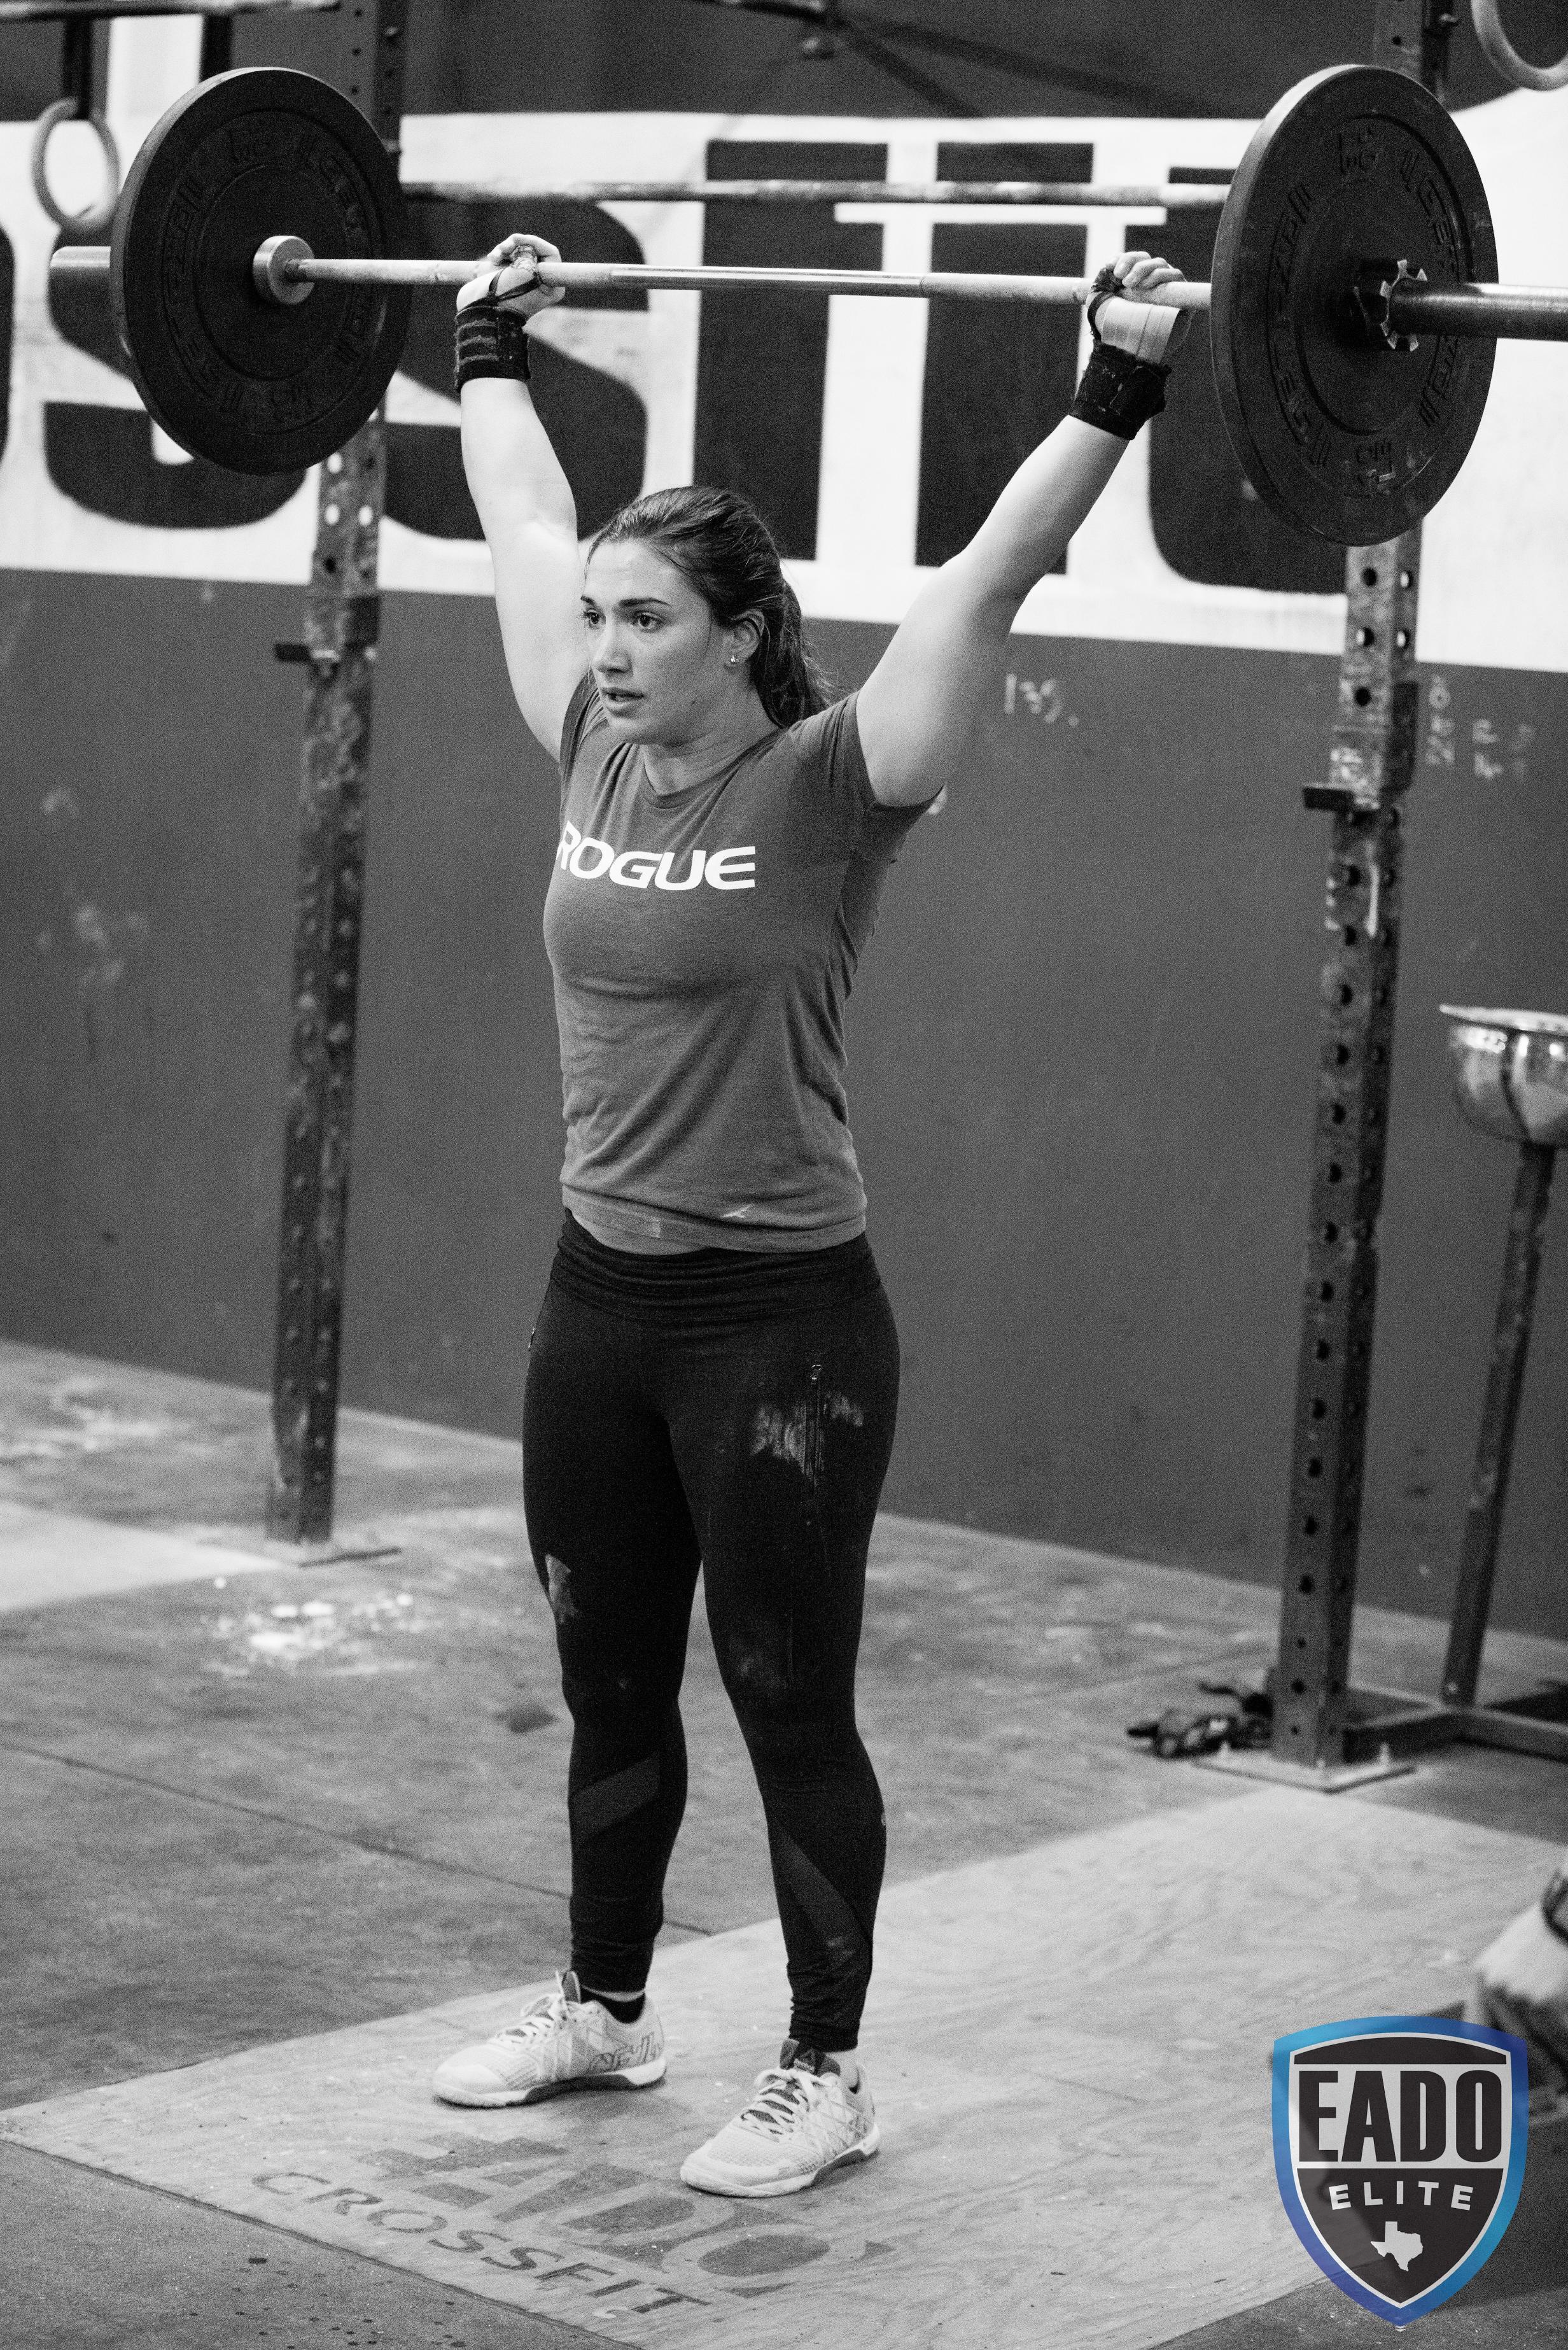 EaDo Elite Athlete Taylor Portugal  Photo Credit: Sierra Prime